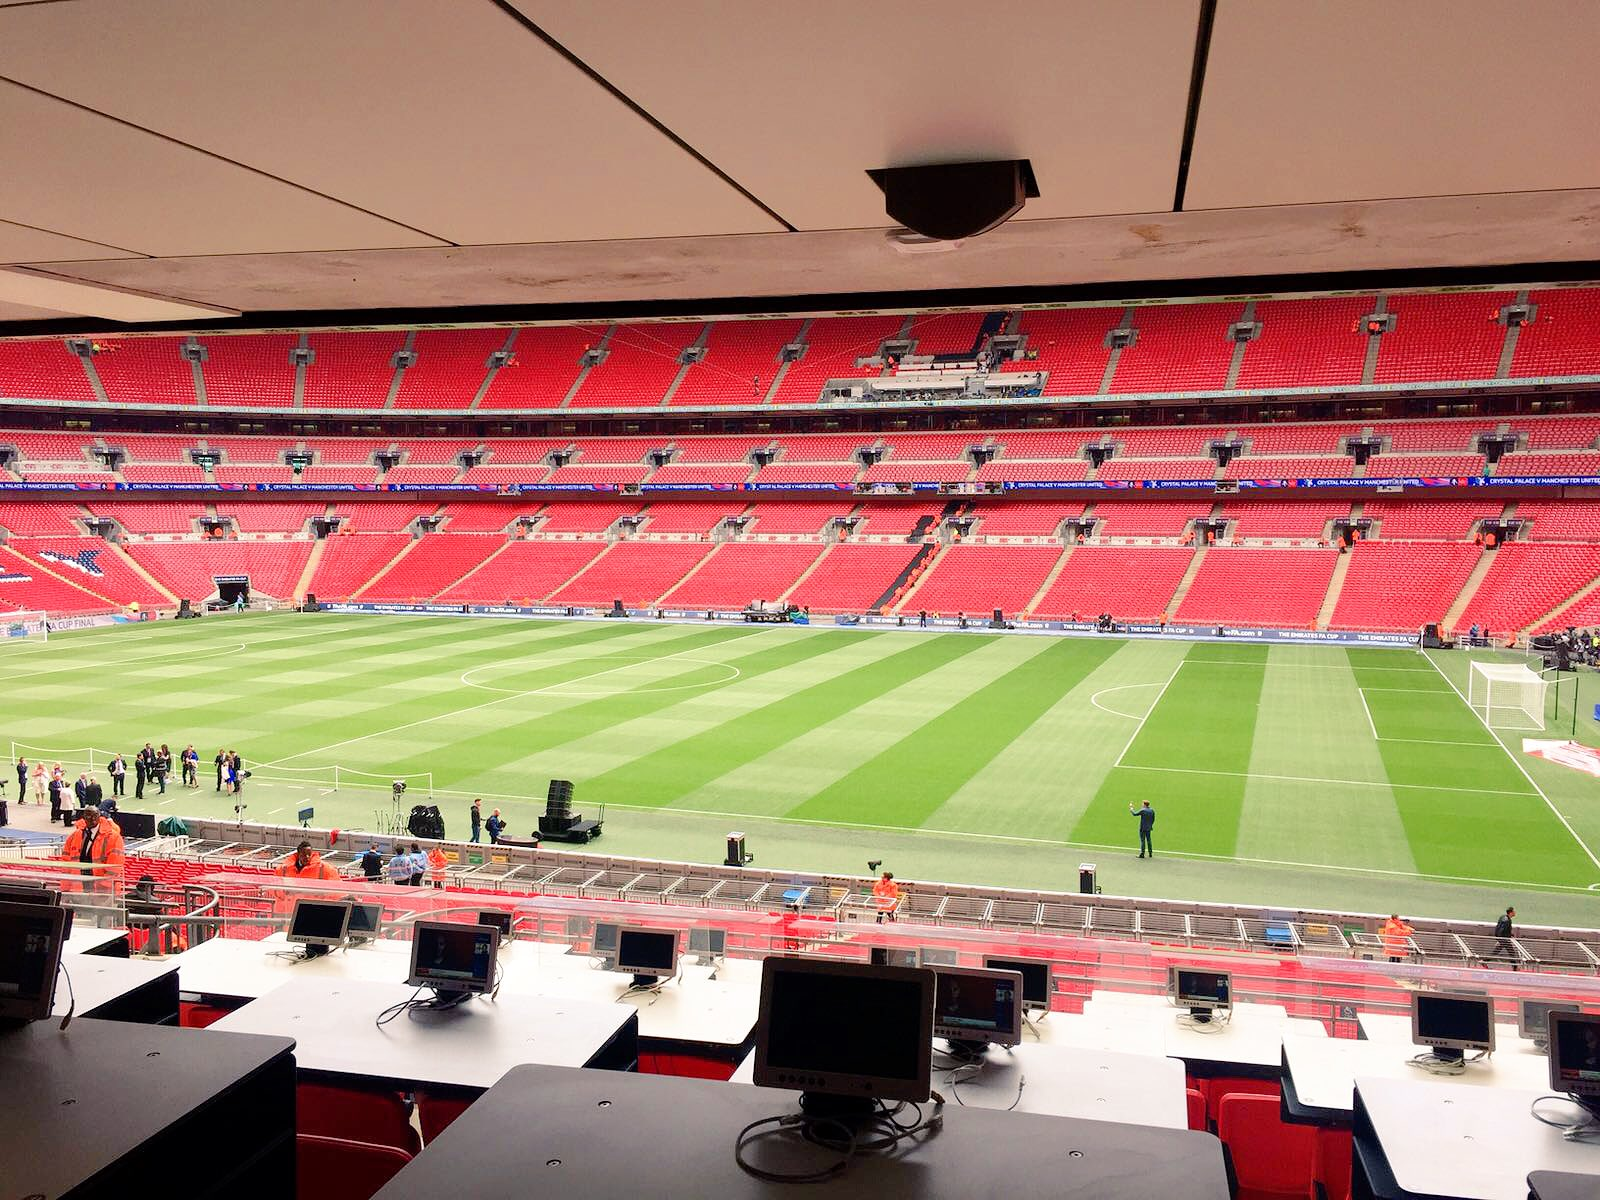 RT @ManUtd: In position nice and early in the @WembleyStadium press box. #WeAreUnited https://t.co/NZ2fJ0veNy